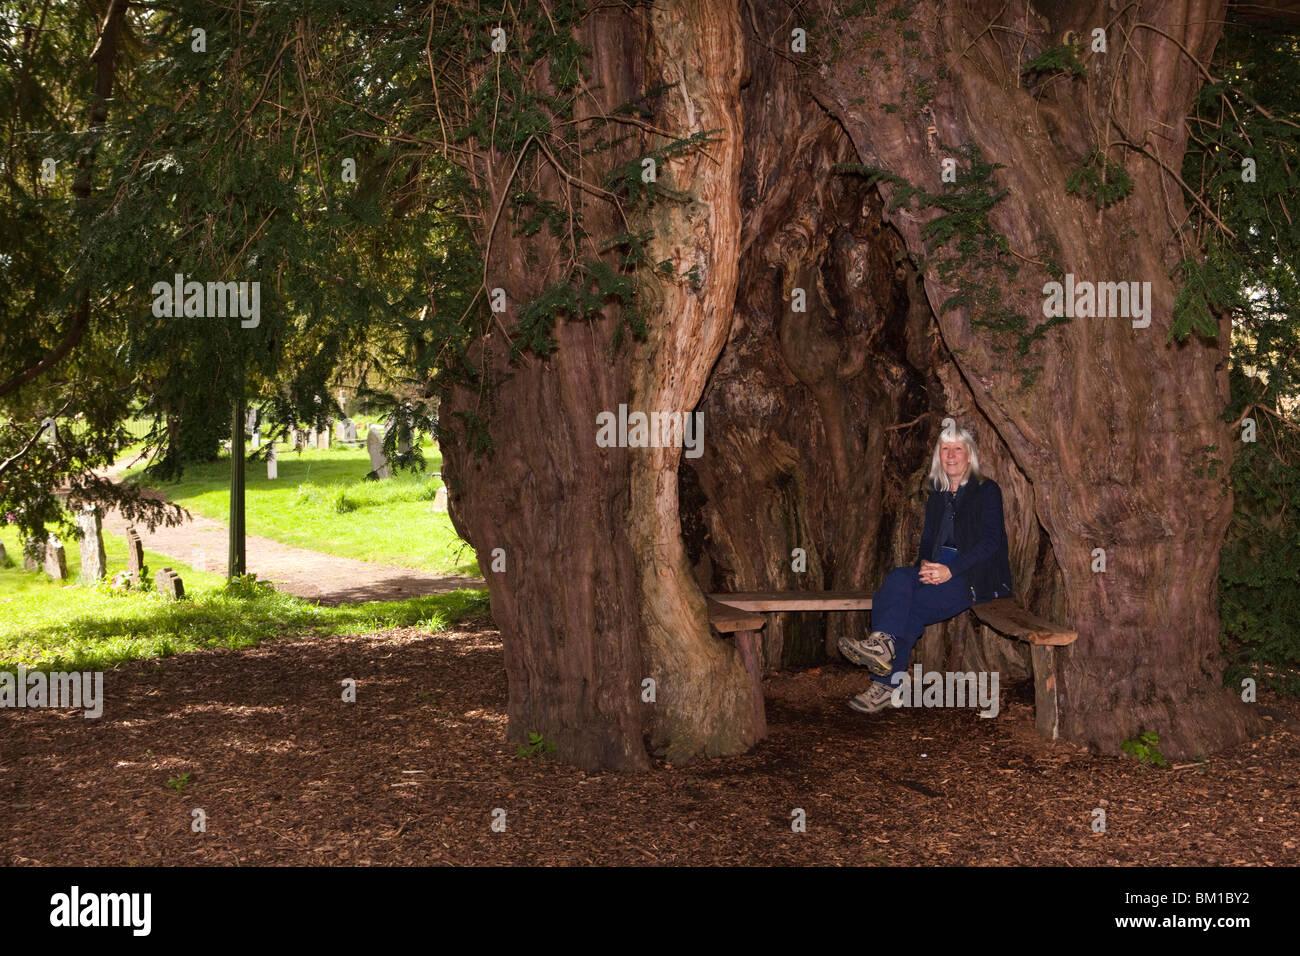 UK, England, Herefordshire, Much Marcle, St Bartholomew's churchyard, woman sat on seat inside old hollow yew tree - Stock Image